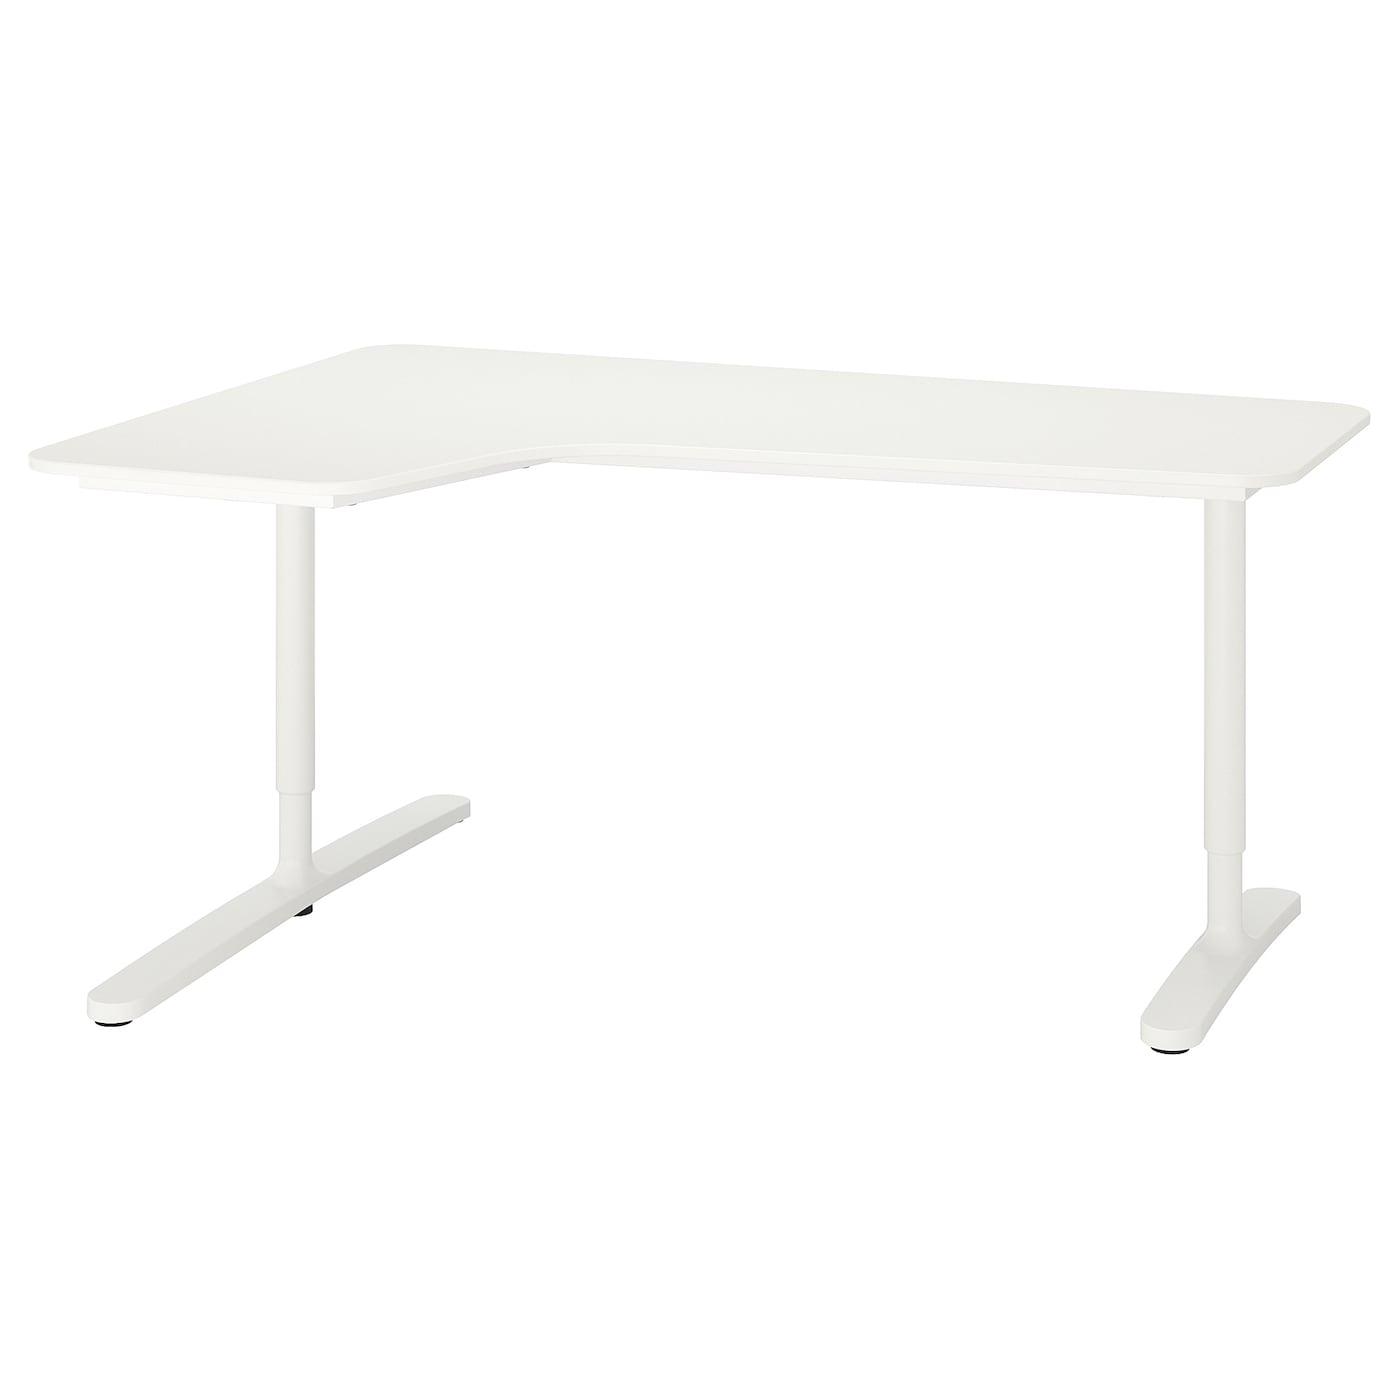 Bekant Scrivania Angolare Sinistra Bianco 160x110 Cm Ikea It